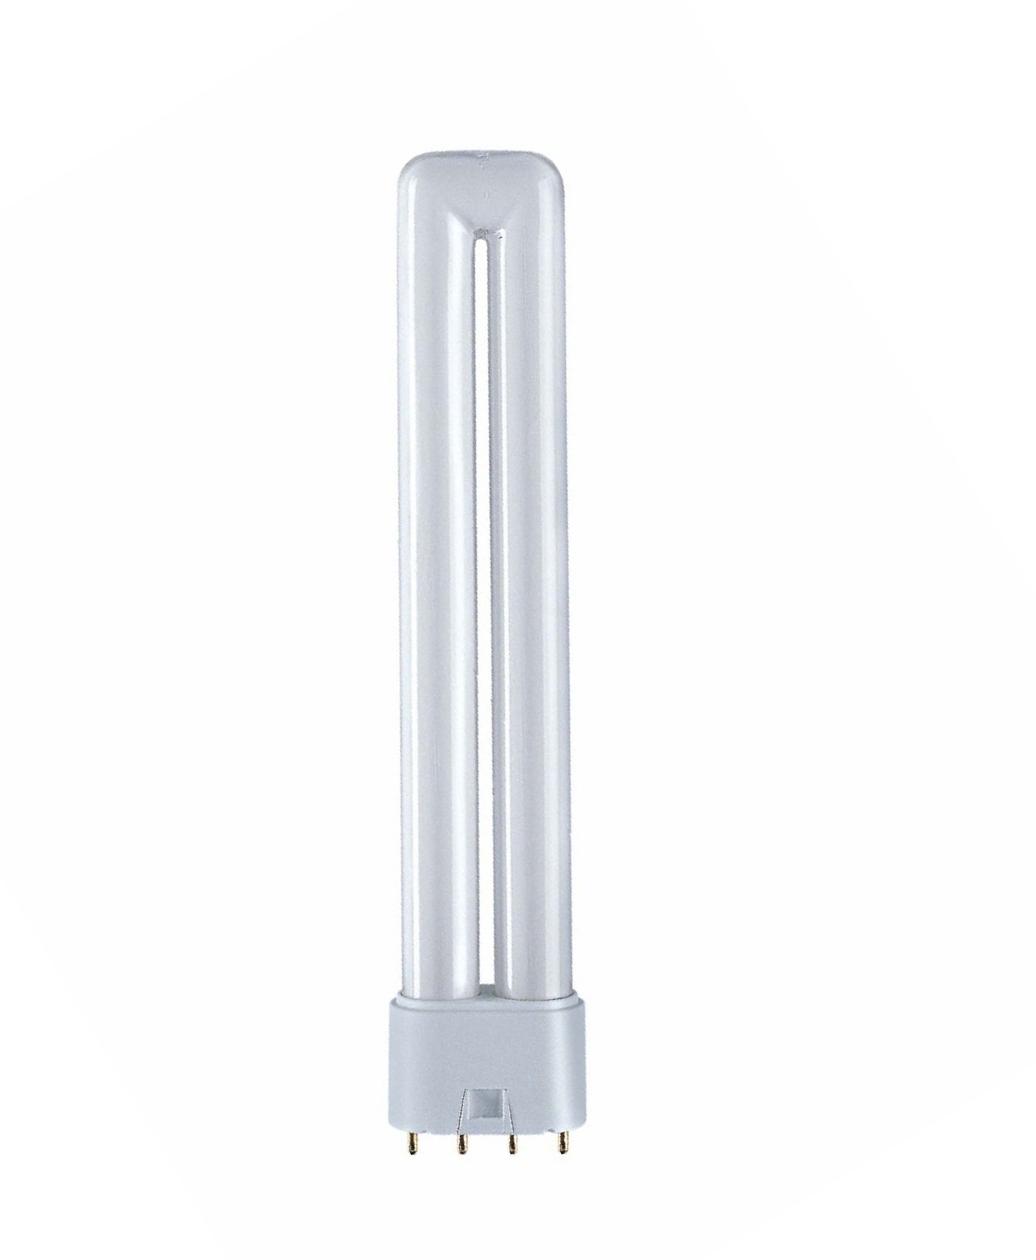 PL-L 55W/840/4P 2G11 Kompaktleuchtstofflampe Neutralweiß